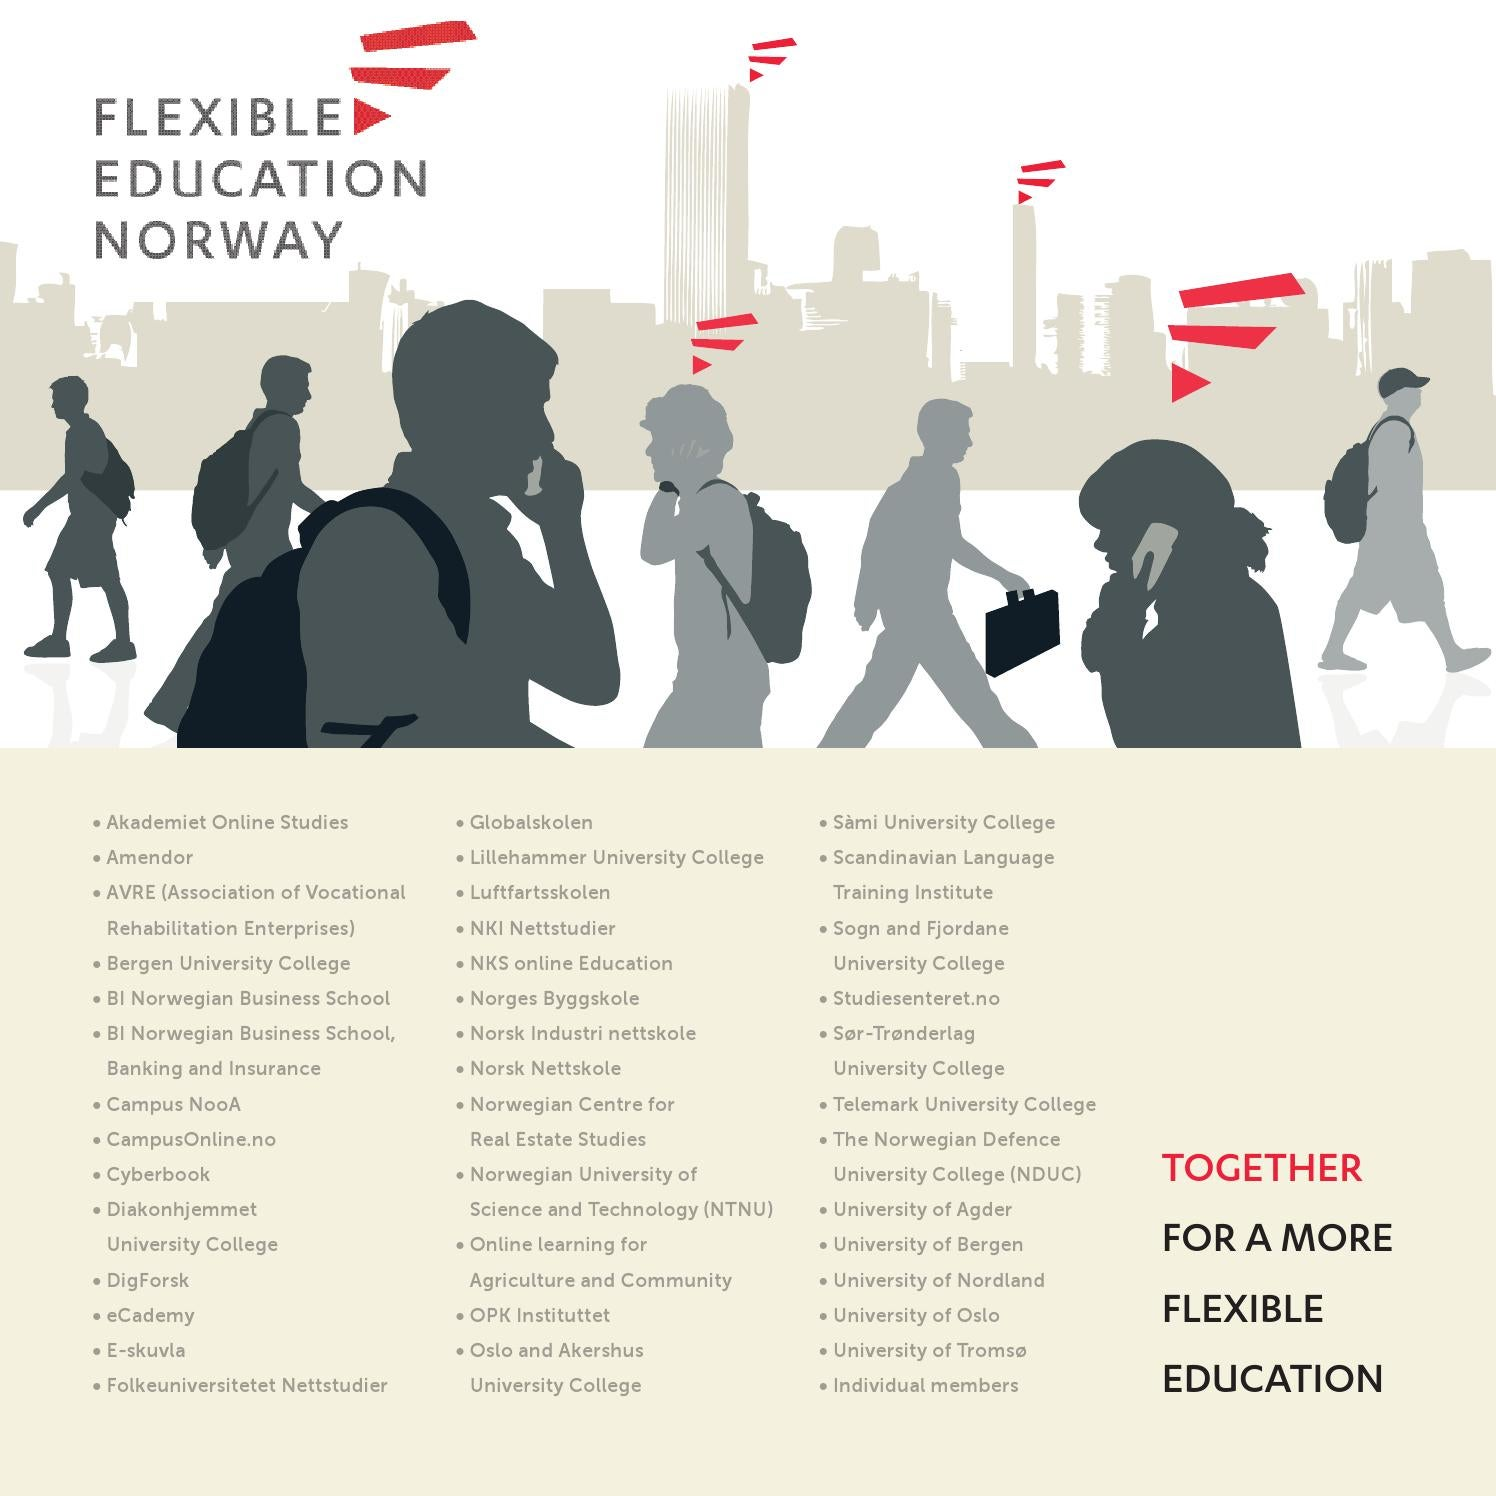 medlemsbrosjyre 2013 english version by fleksibel